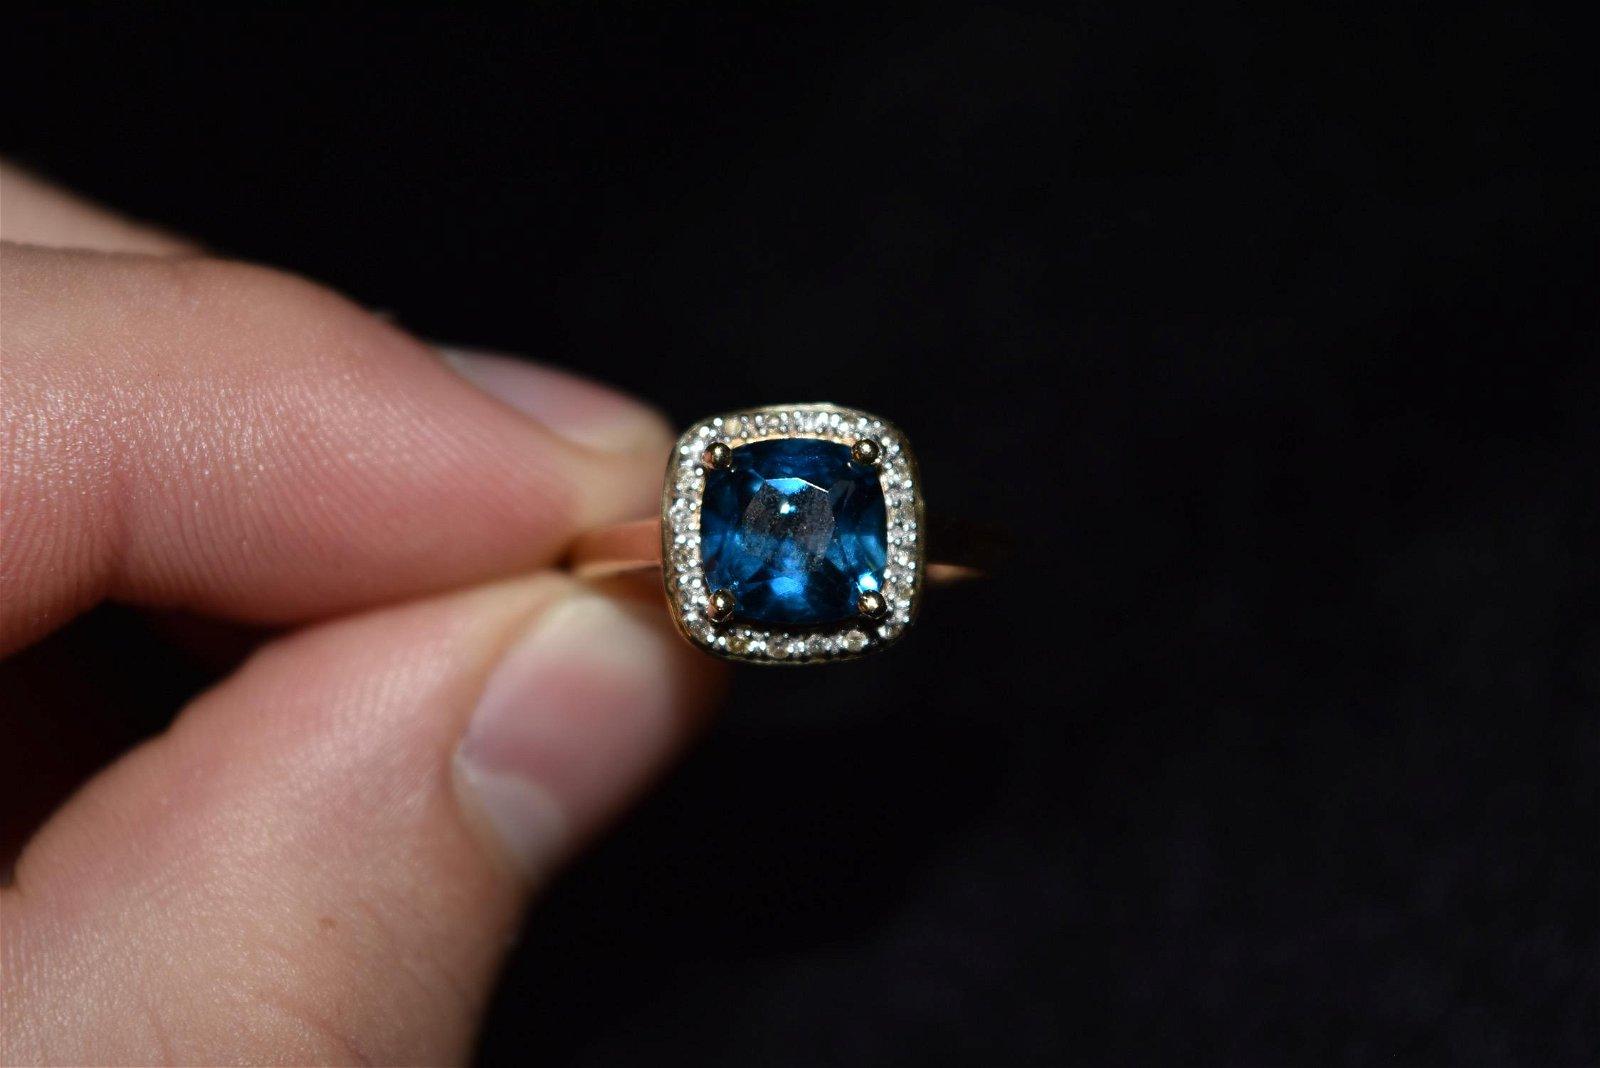 3 ct Aqua Marine & Diamond, 14k Gold Ring, Size 8 1/2